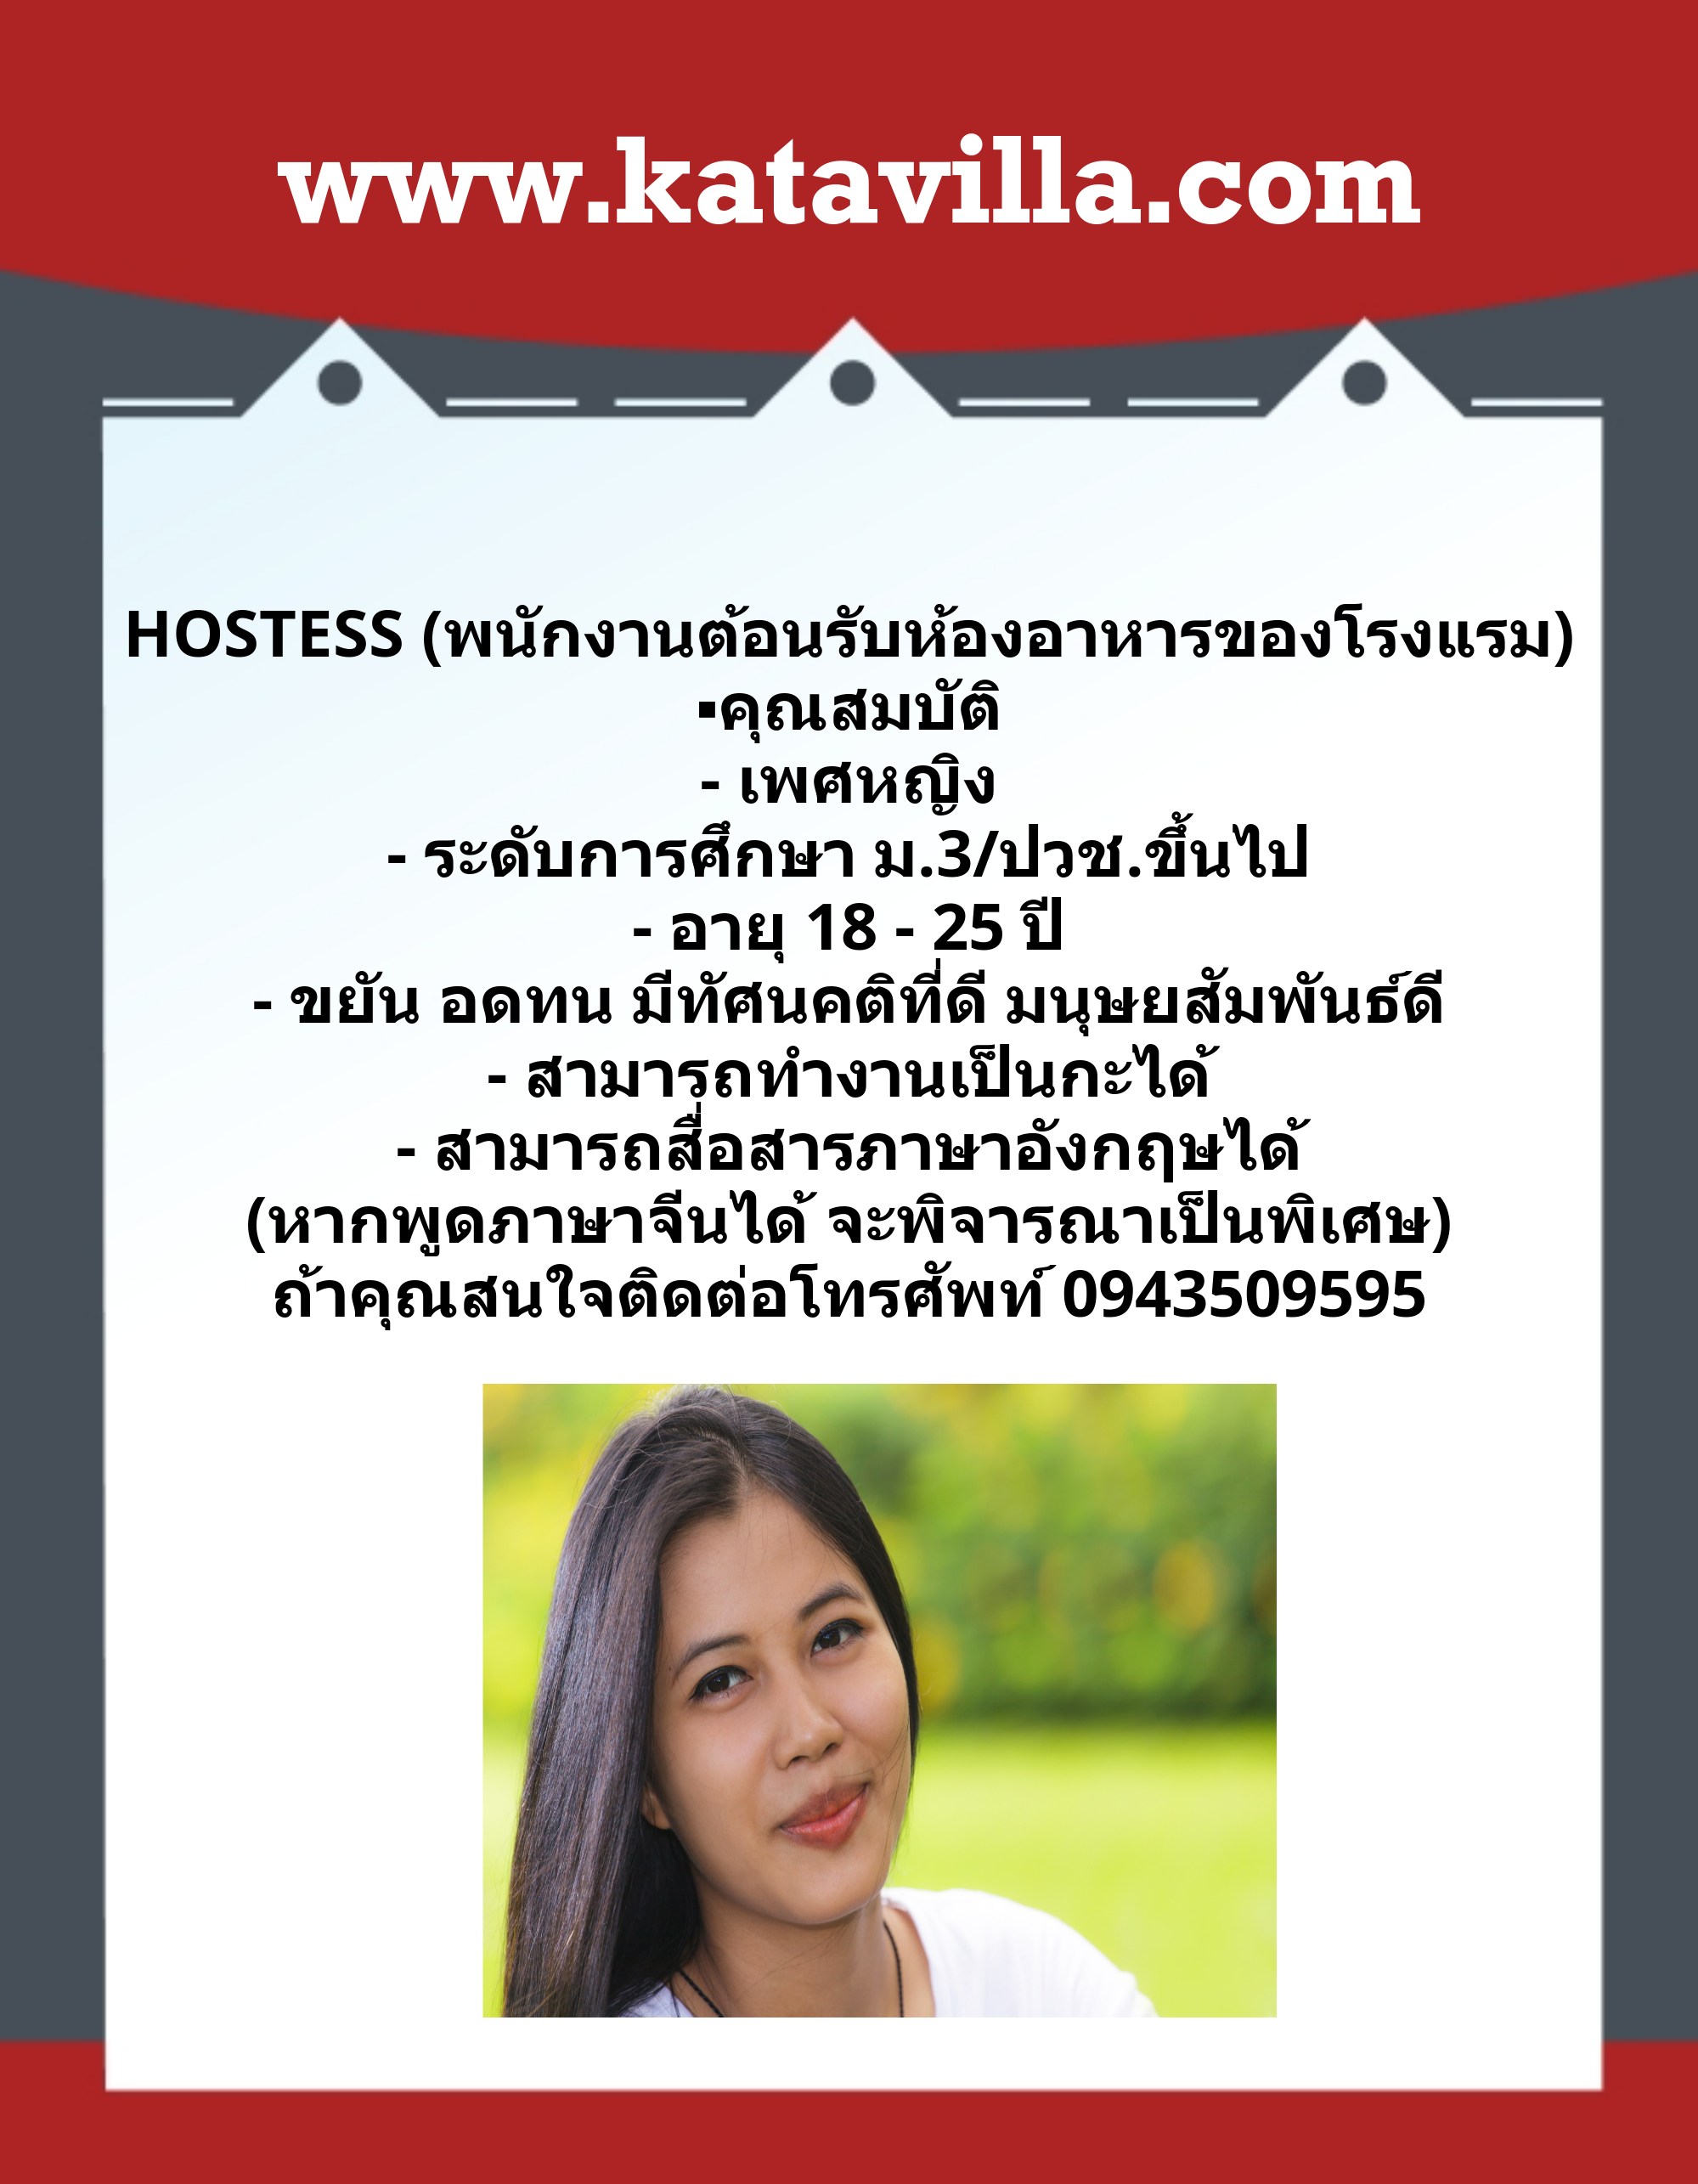 HOSTESS (1)